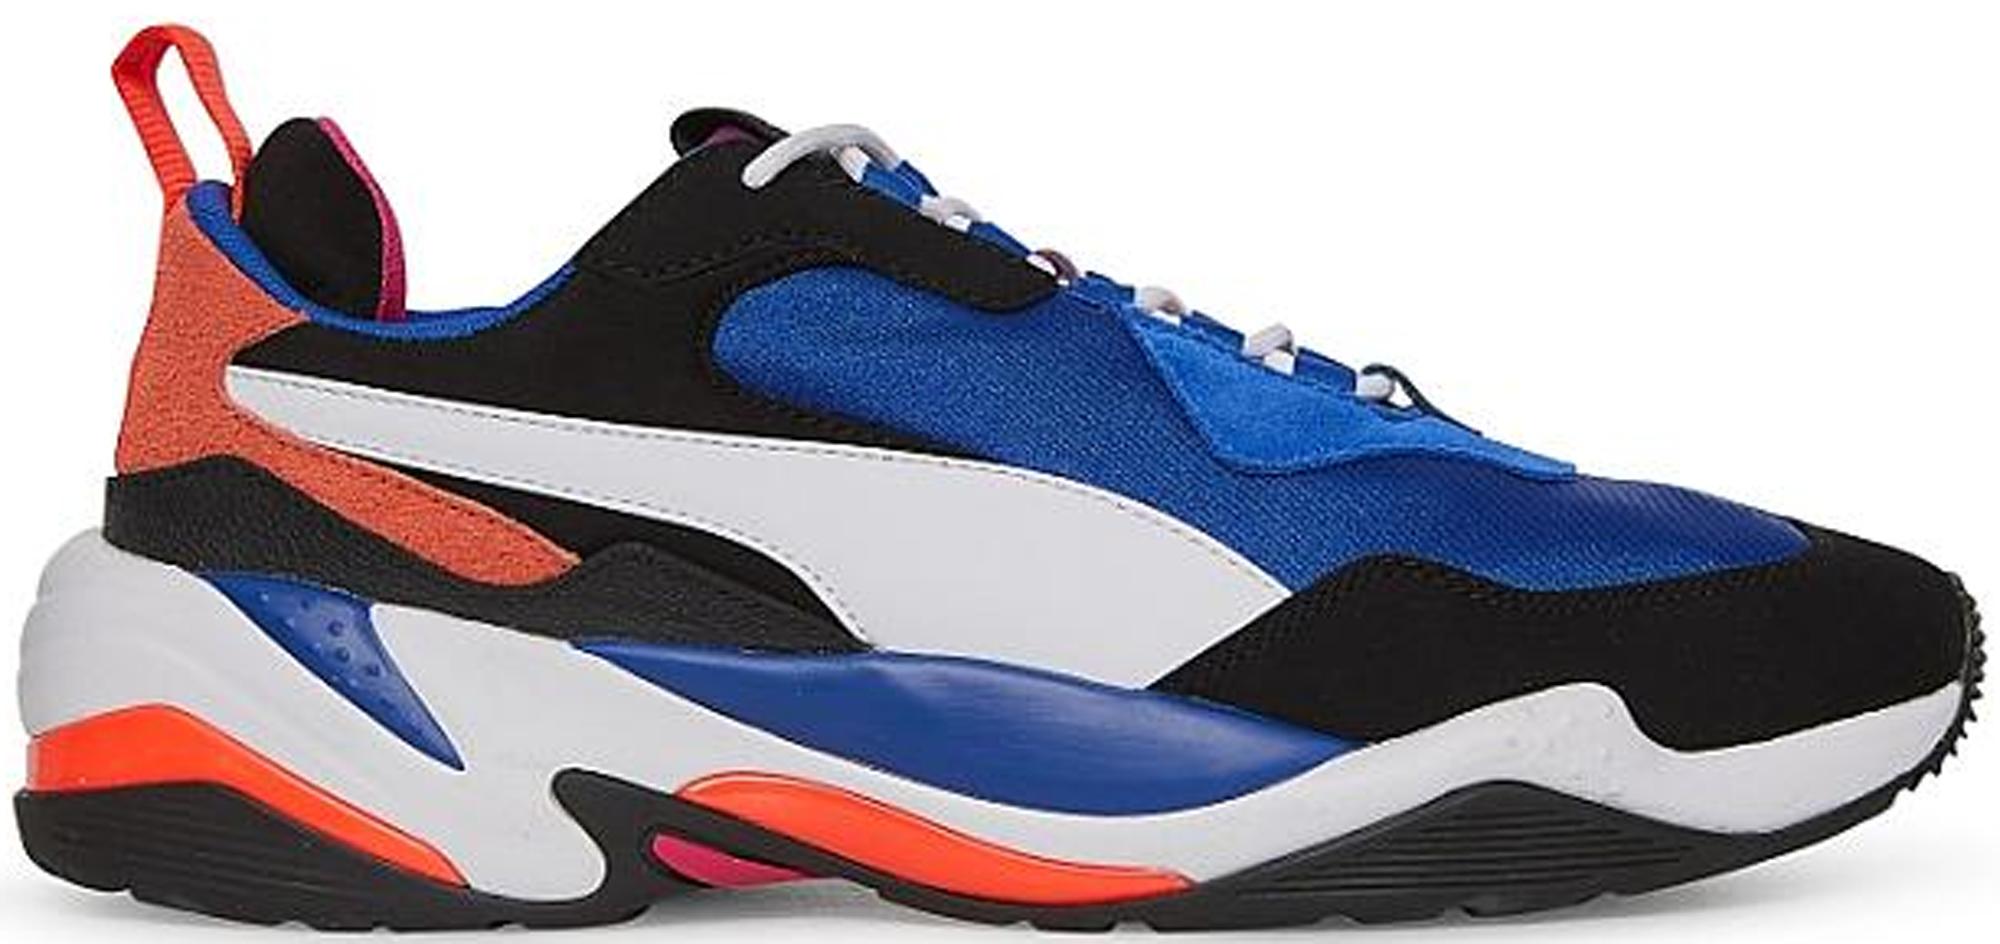 Puma Thunder 4 Life Blue - 369471-01